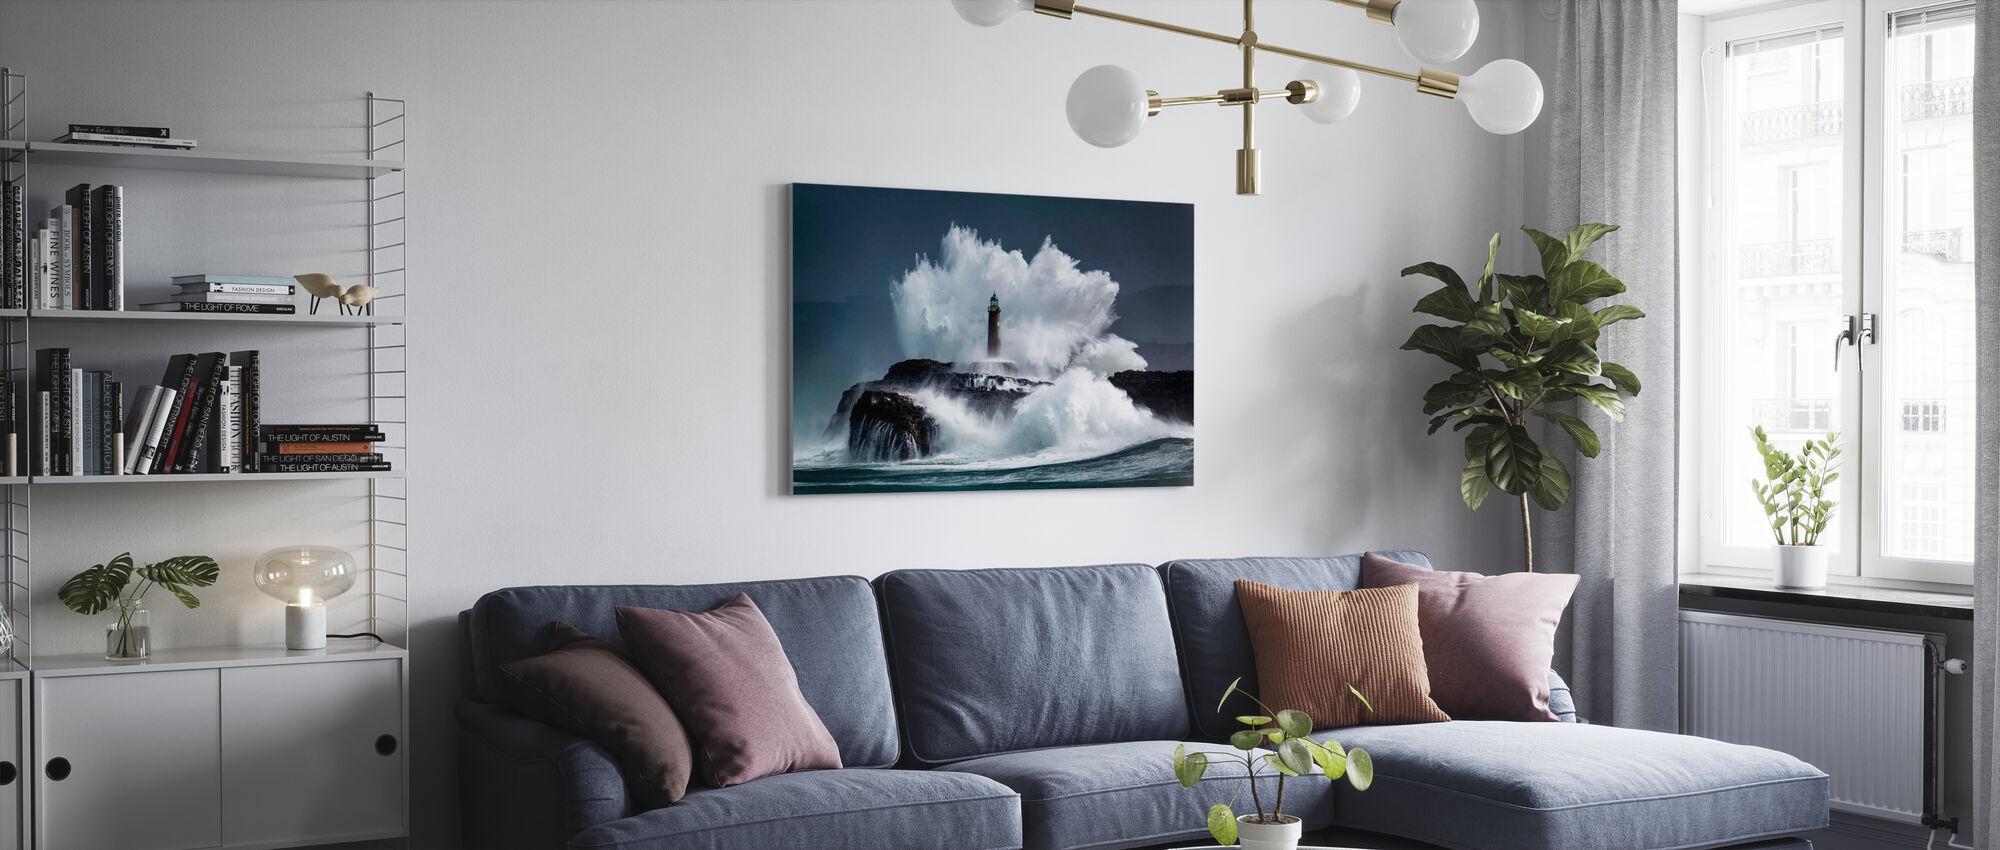 Kamma - Canvastavla - Vardagsrum